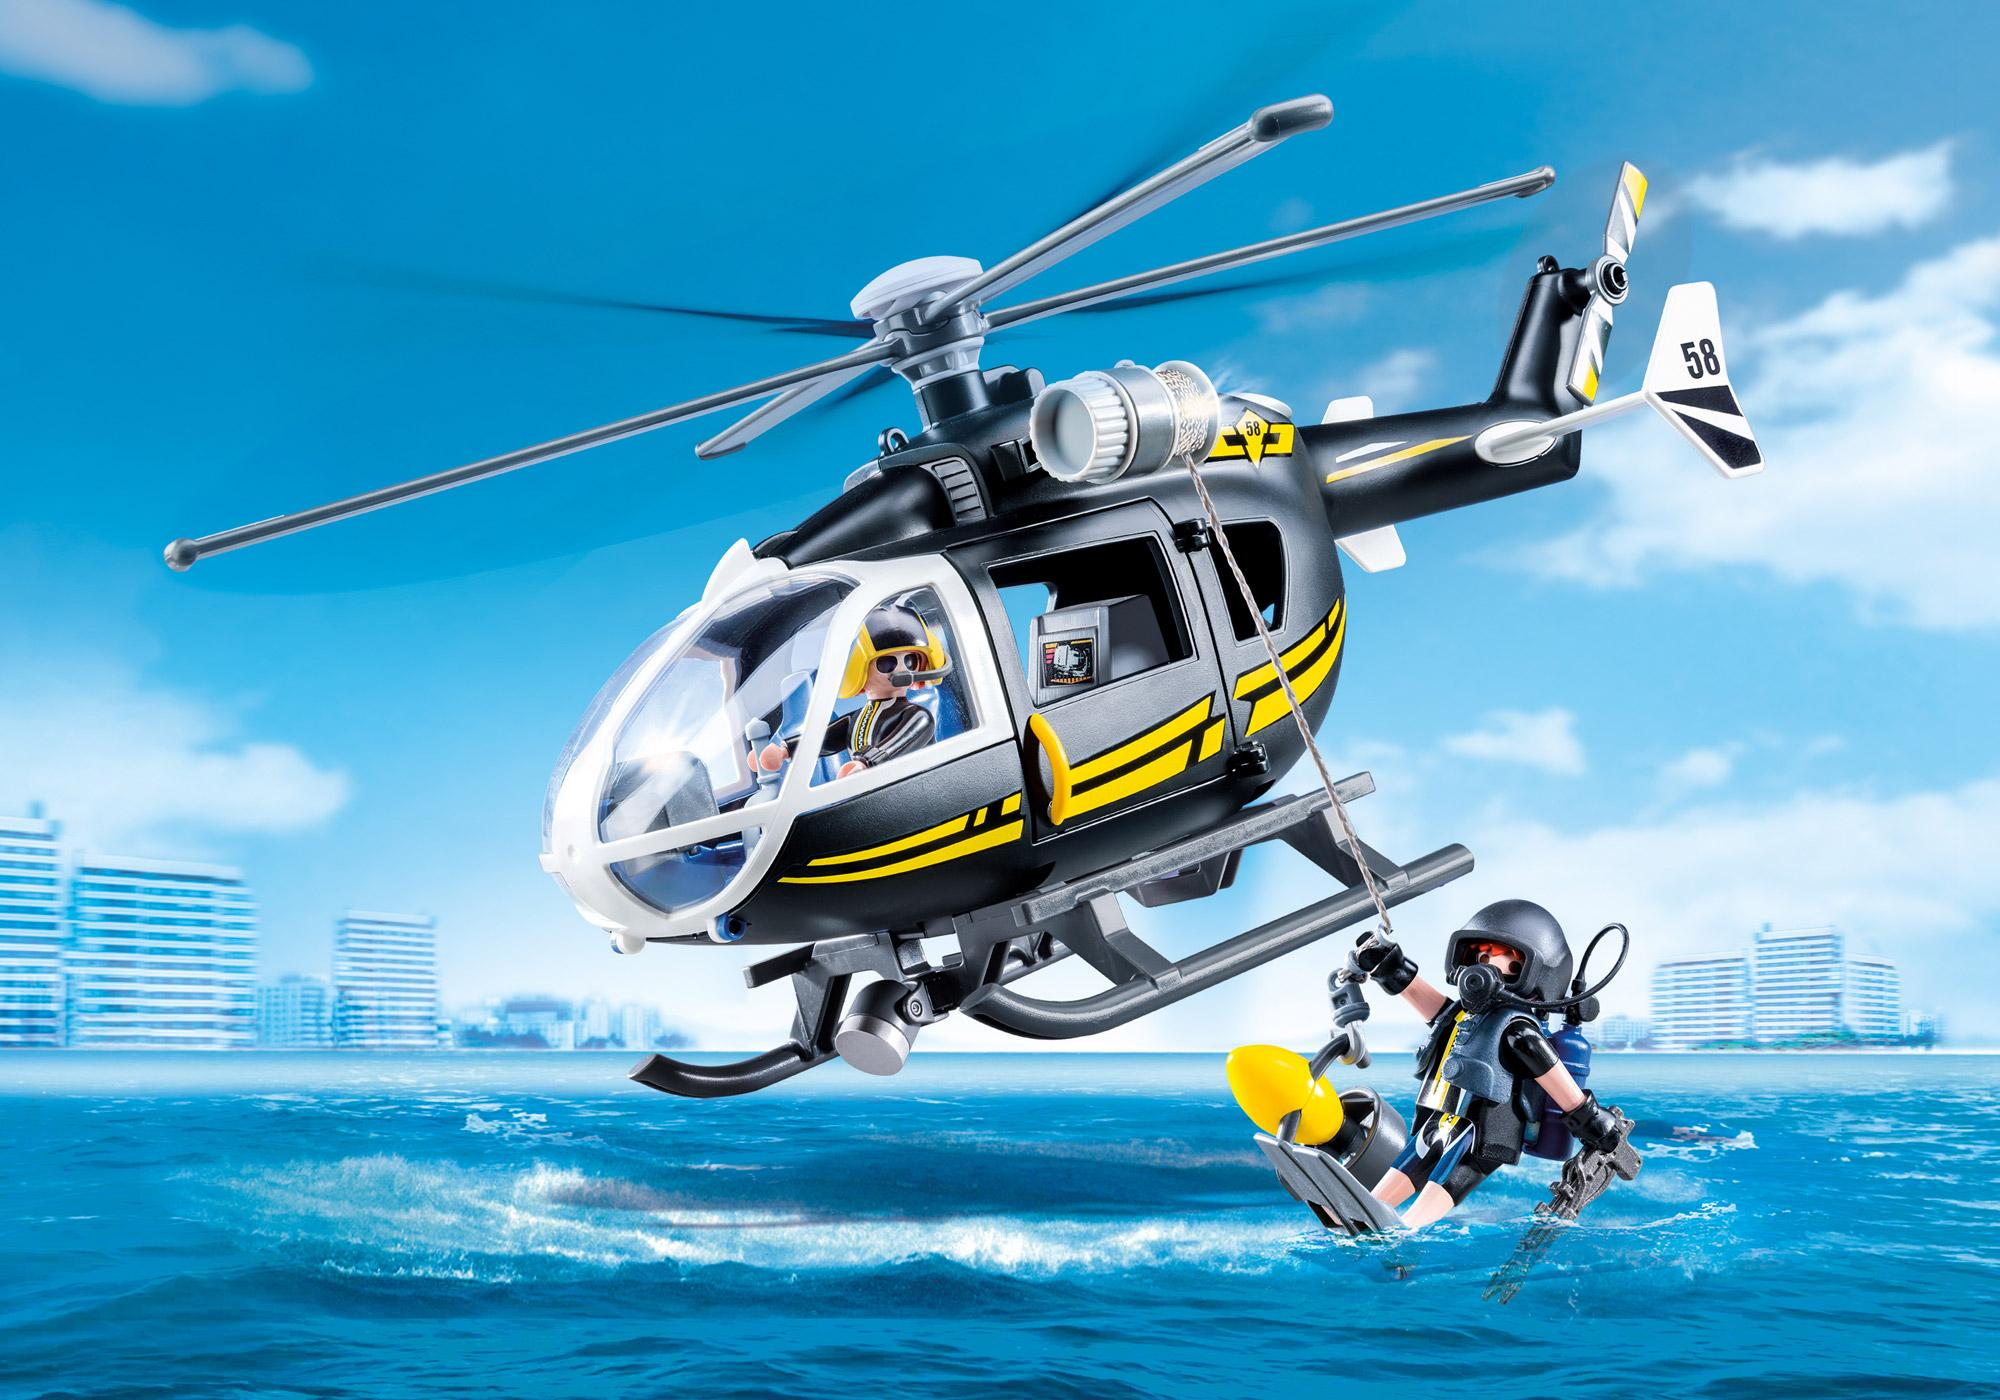 http://media.playmobil.com/i/playmobil/9363_product_detail/Insatshelikopter